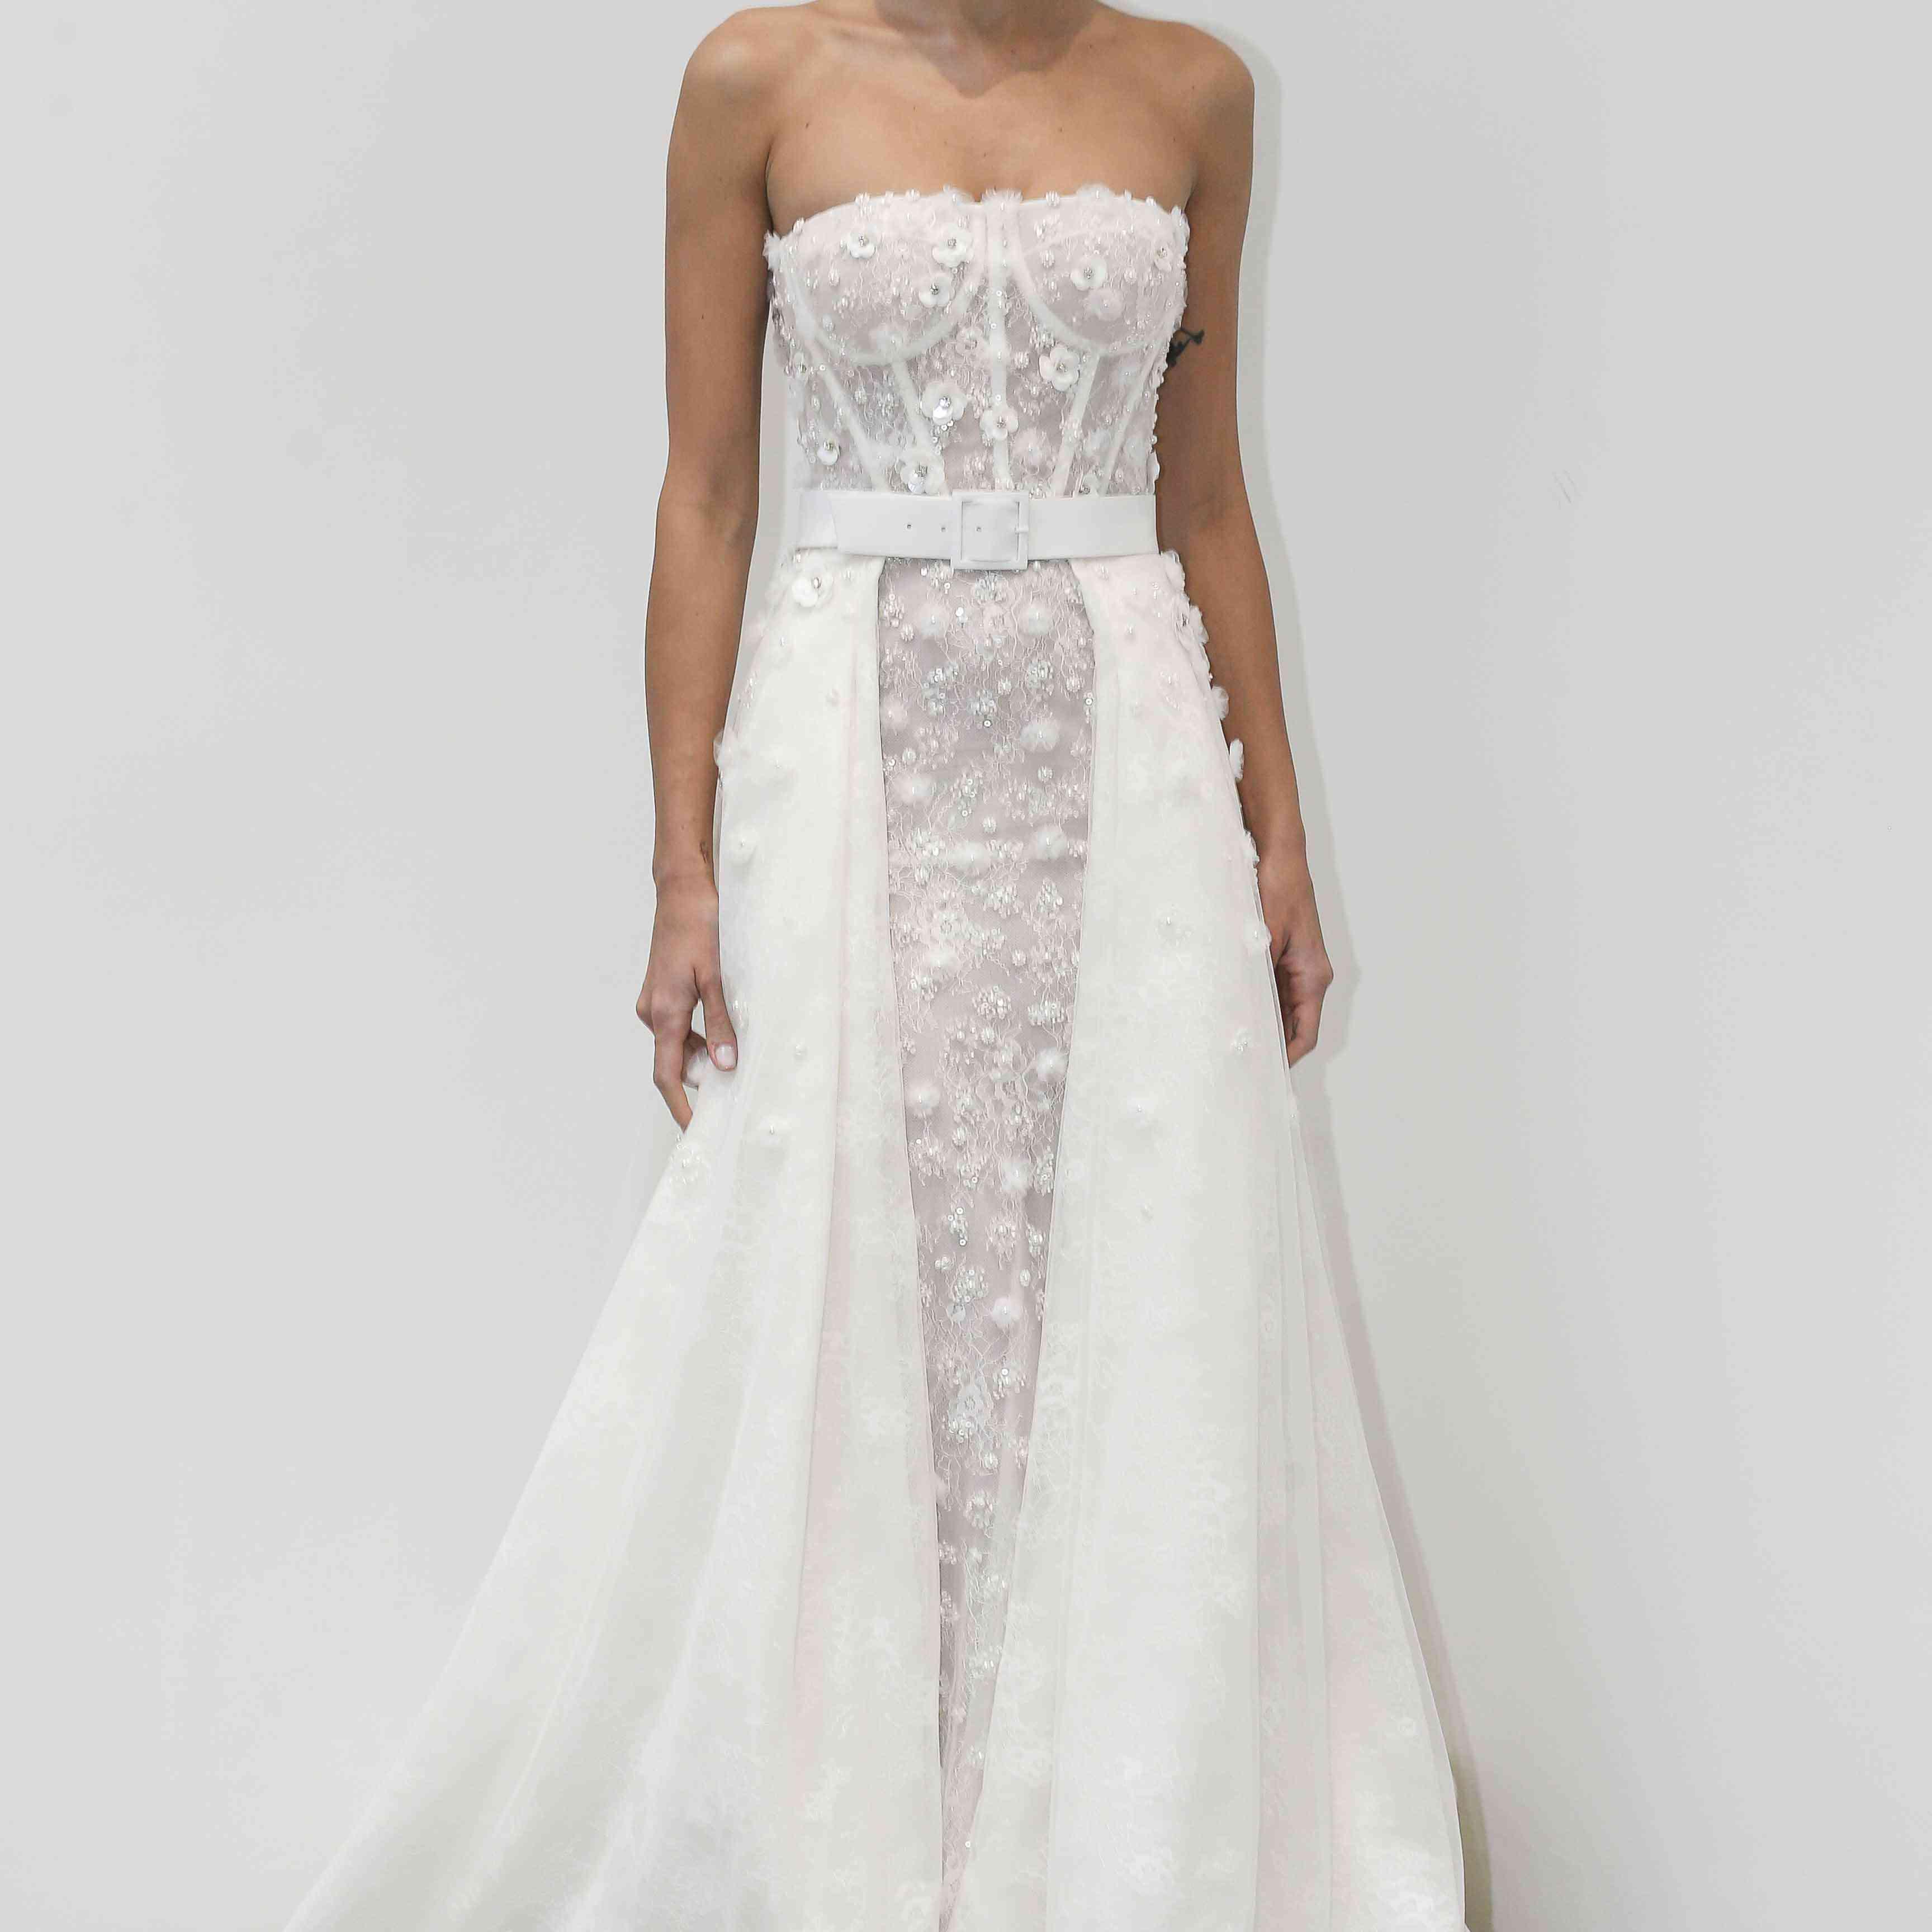 Gigi strapless wedding dress